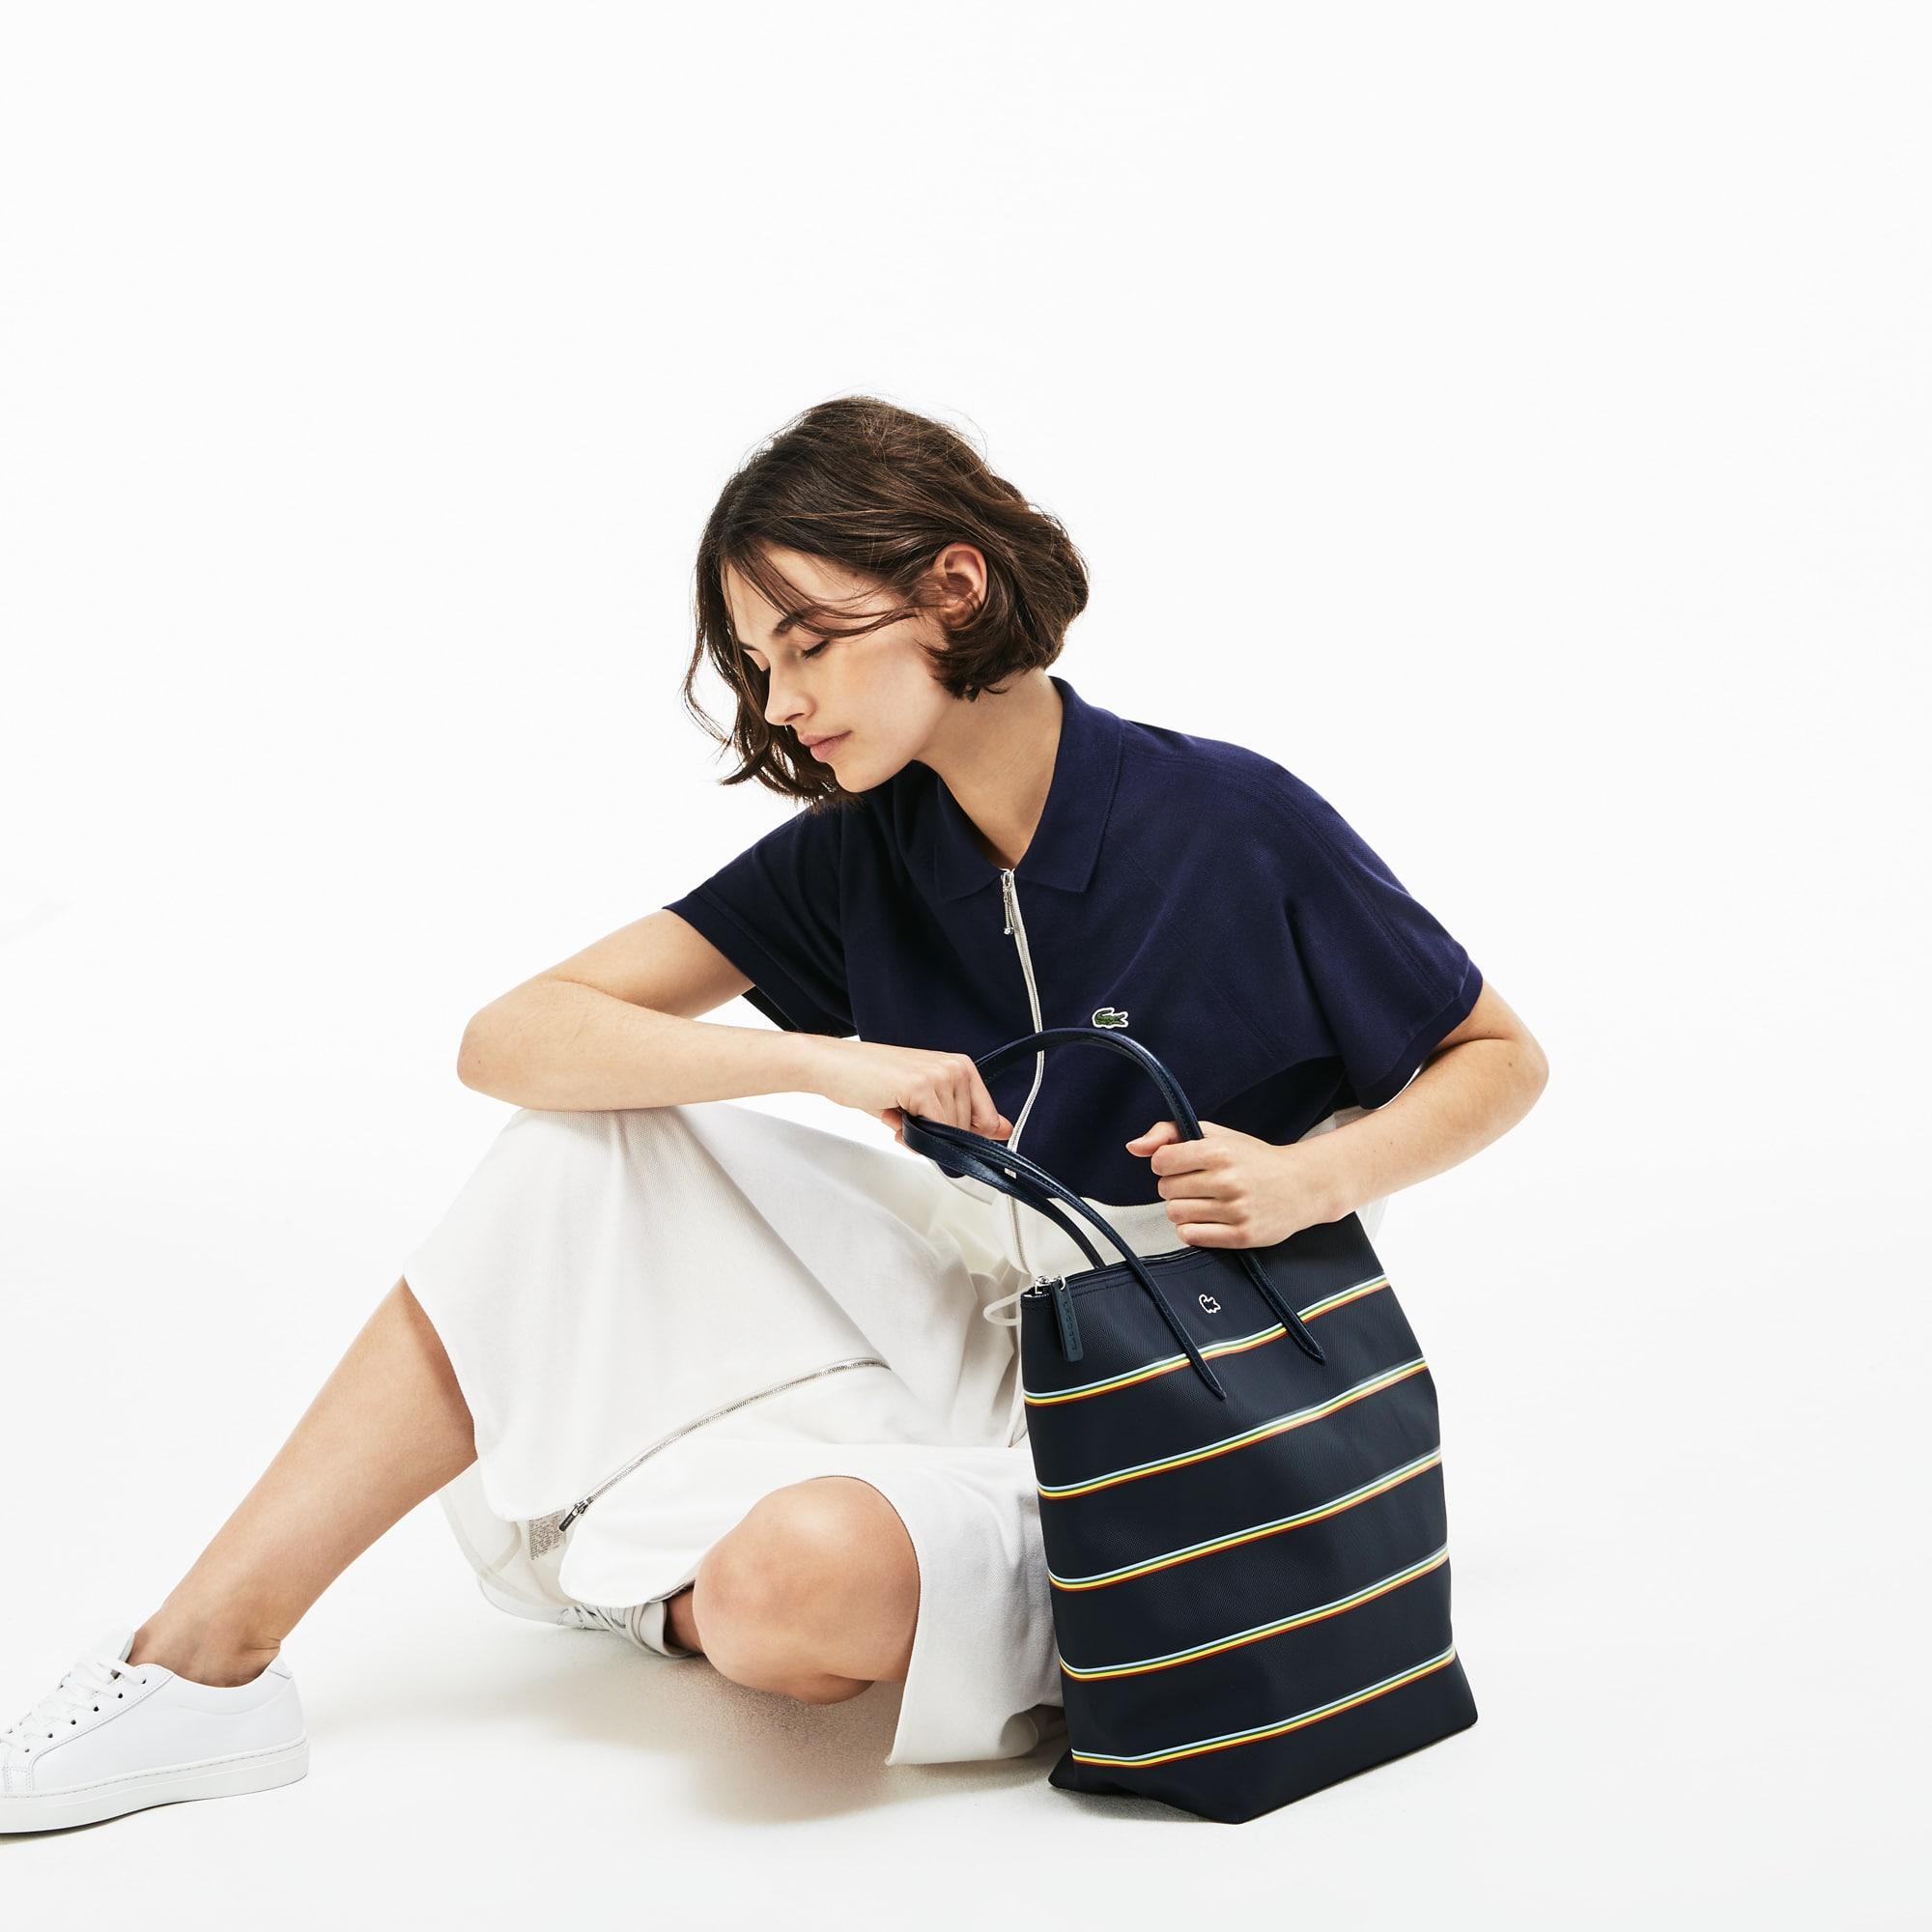 Damen L.12.12 Concept vertikale Tote Bag mit Regenbogenstreifen